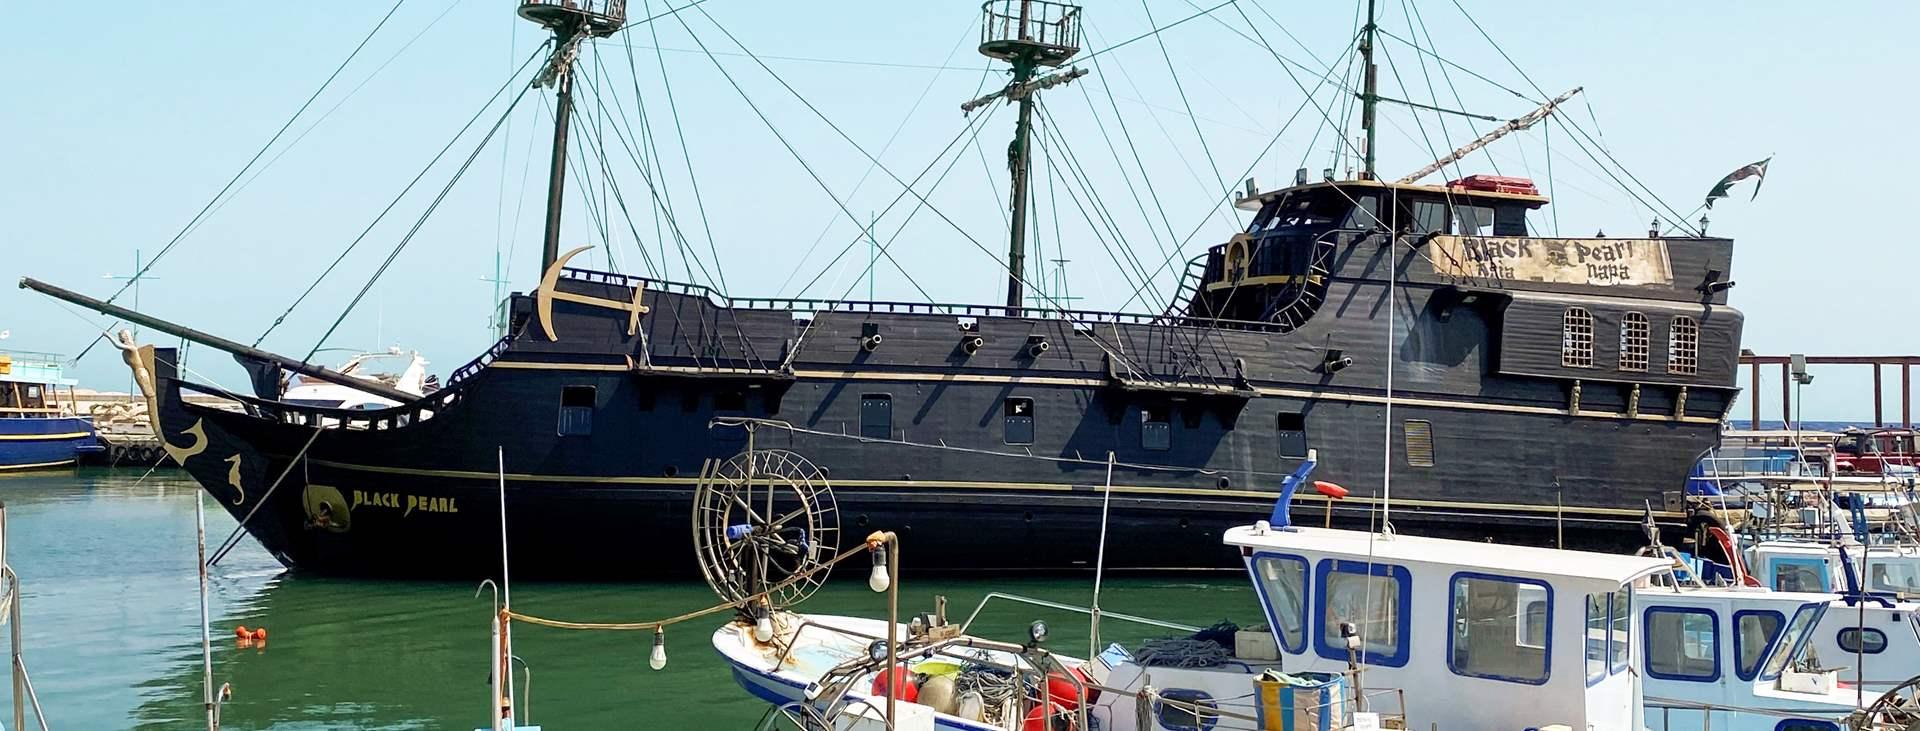 Black Pearls pirater